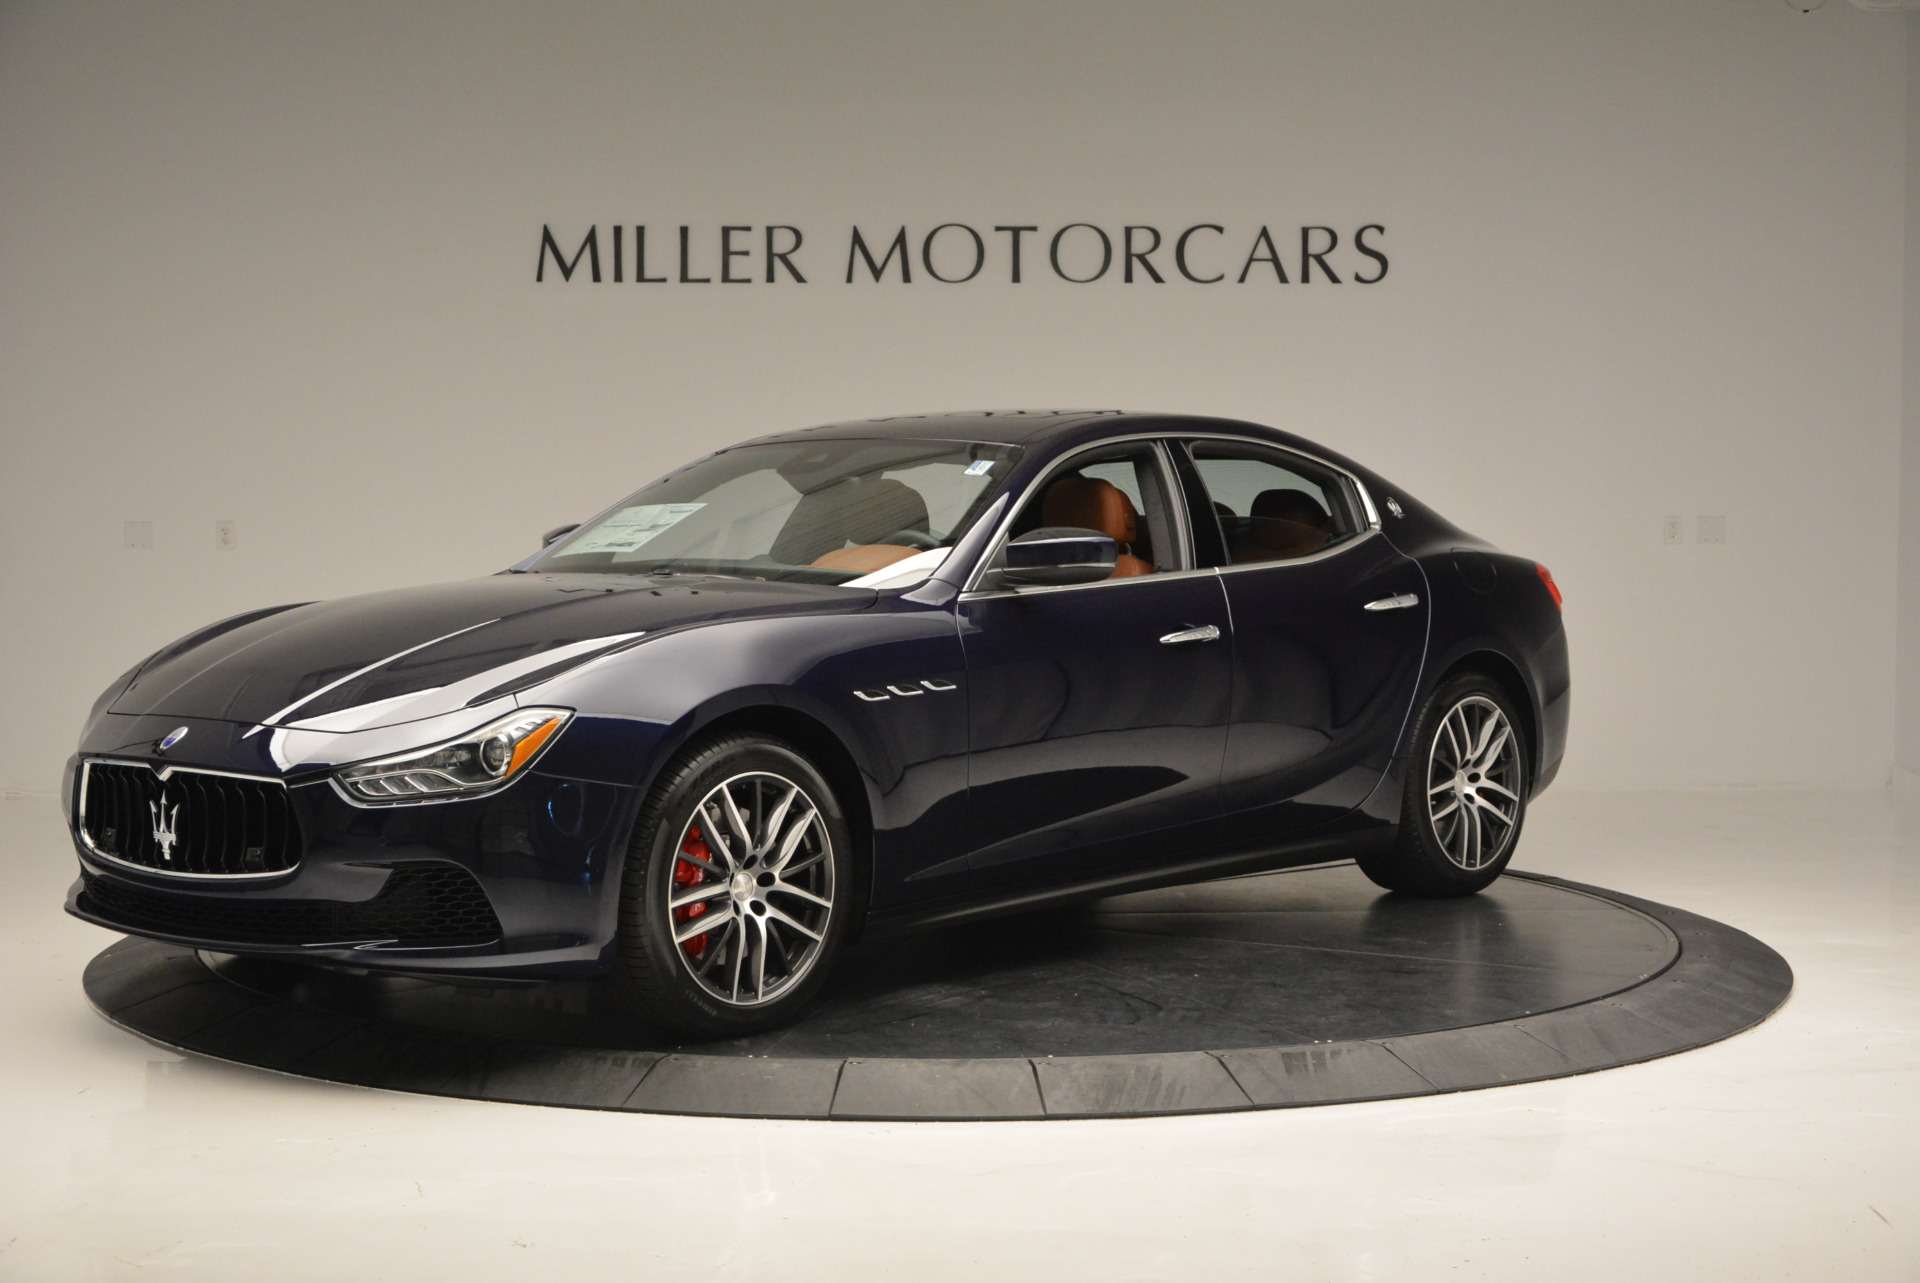 Used 2017 Maserati Ghibli S Q4 - EX Loaner For Sale In Greenwich, CT. Alfa Romeo of Greenwich, M1662 568_p2